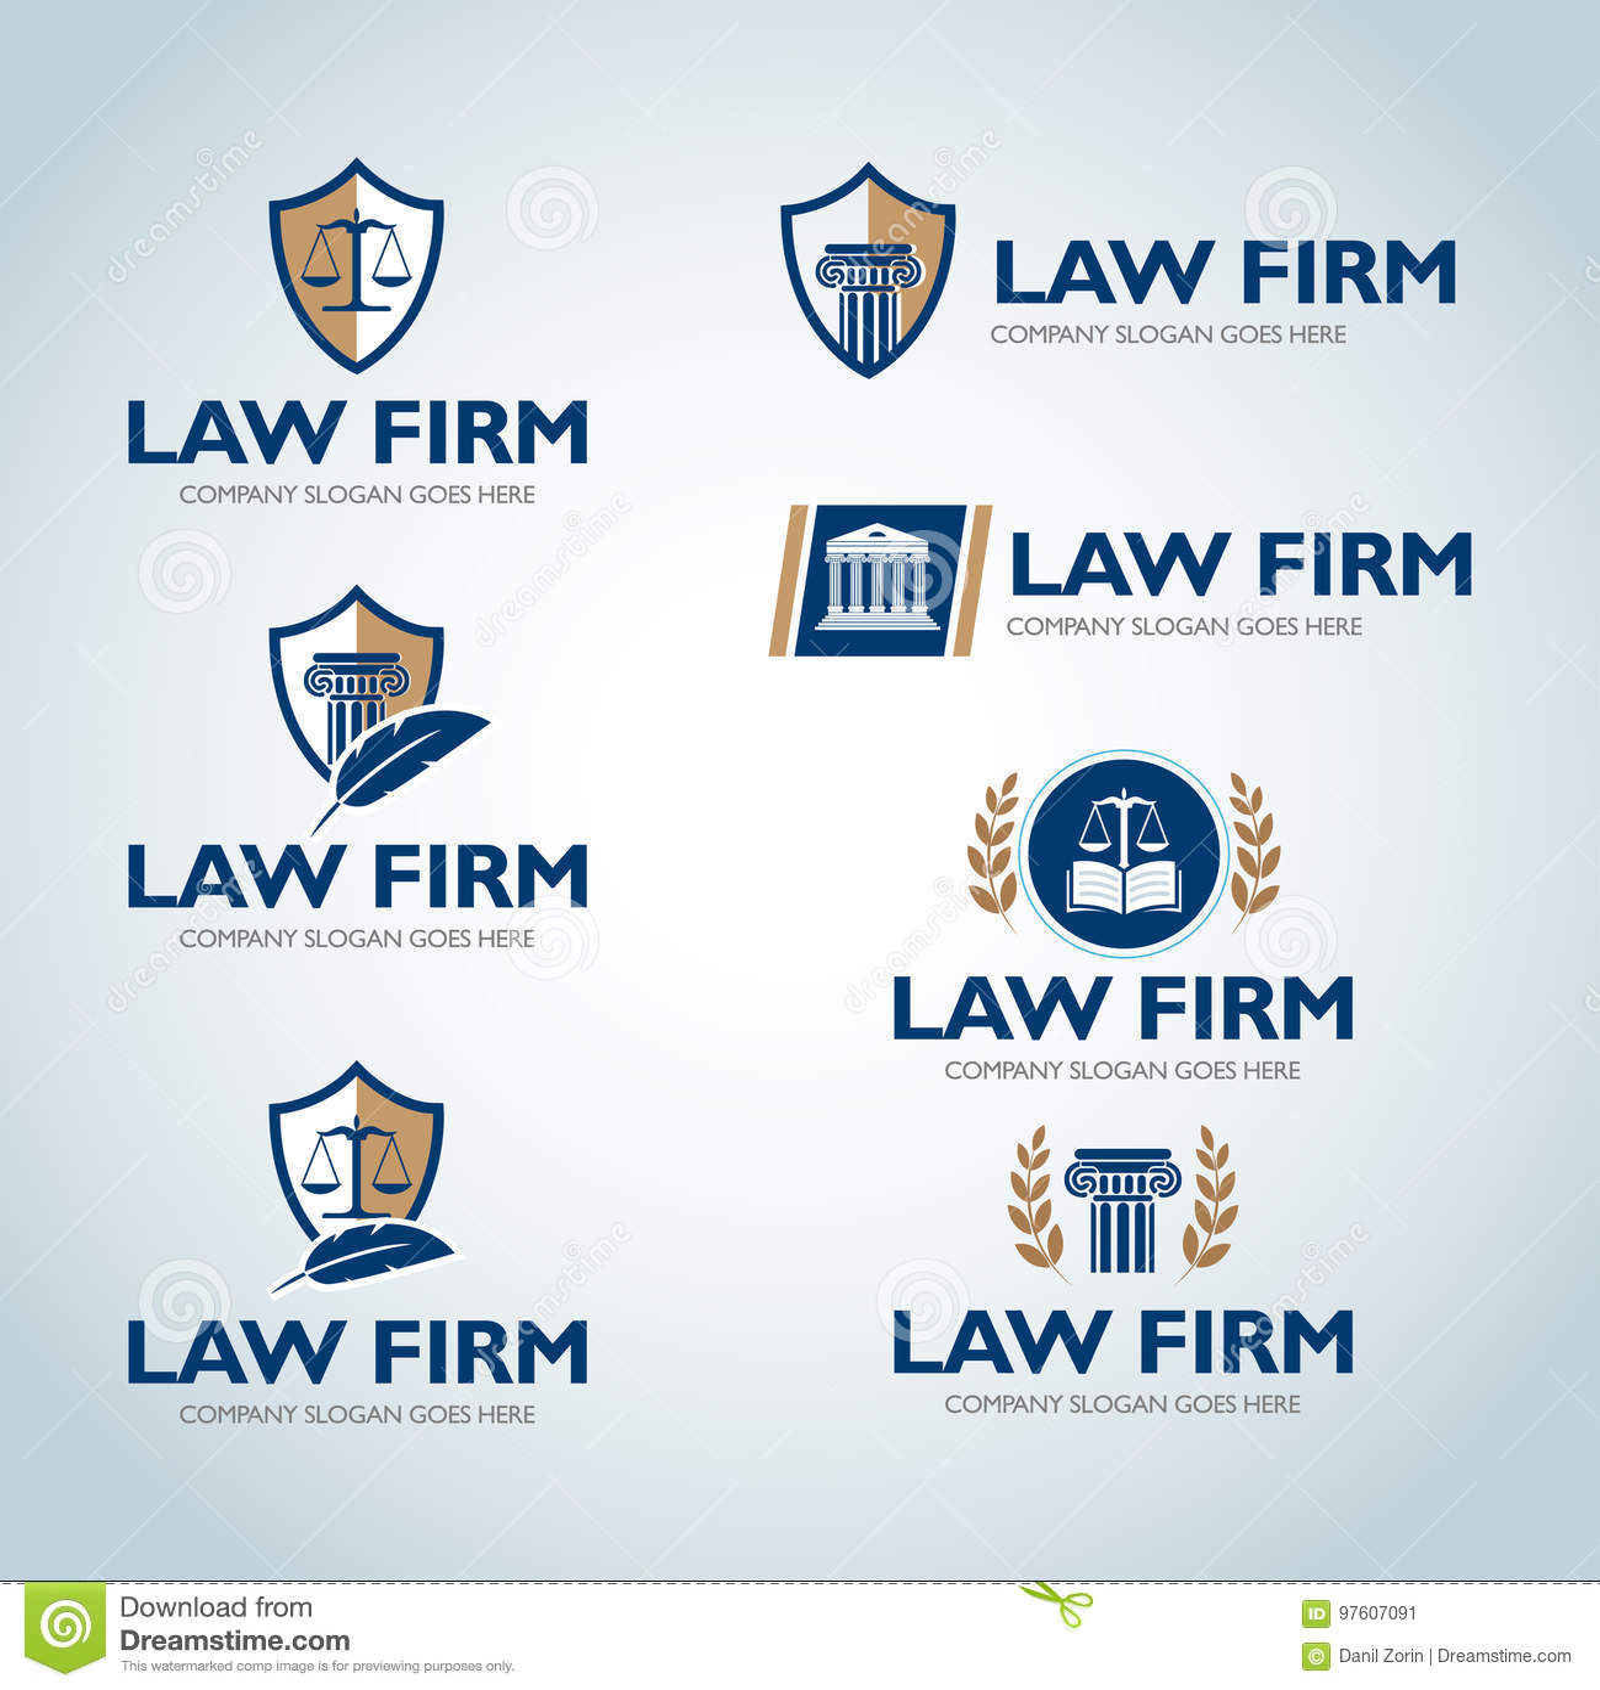 Lawyer Logo Design Templates. Law Office Logo Set. The Judge, Law ...